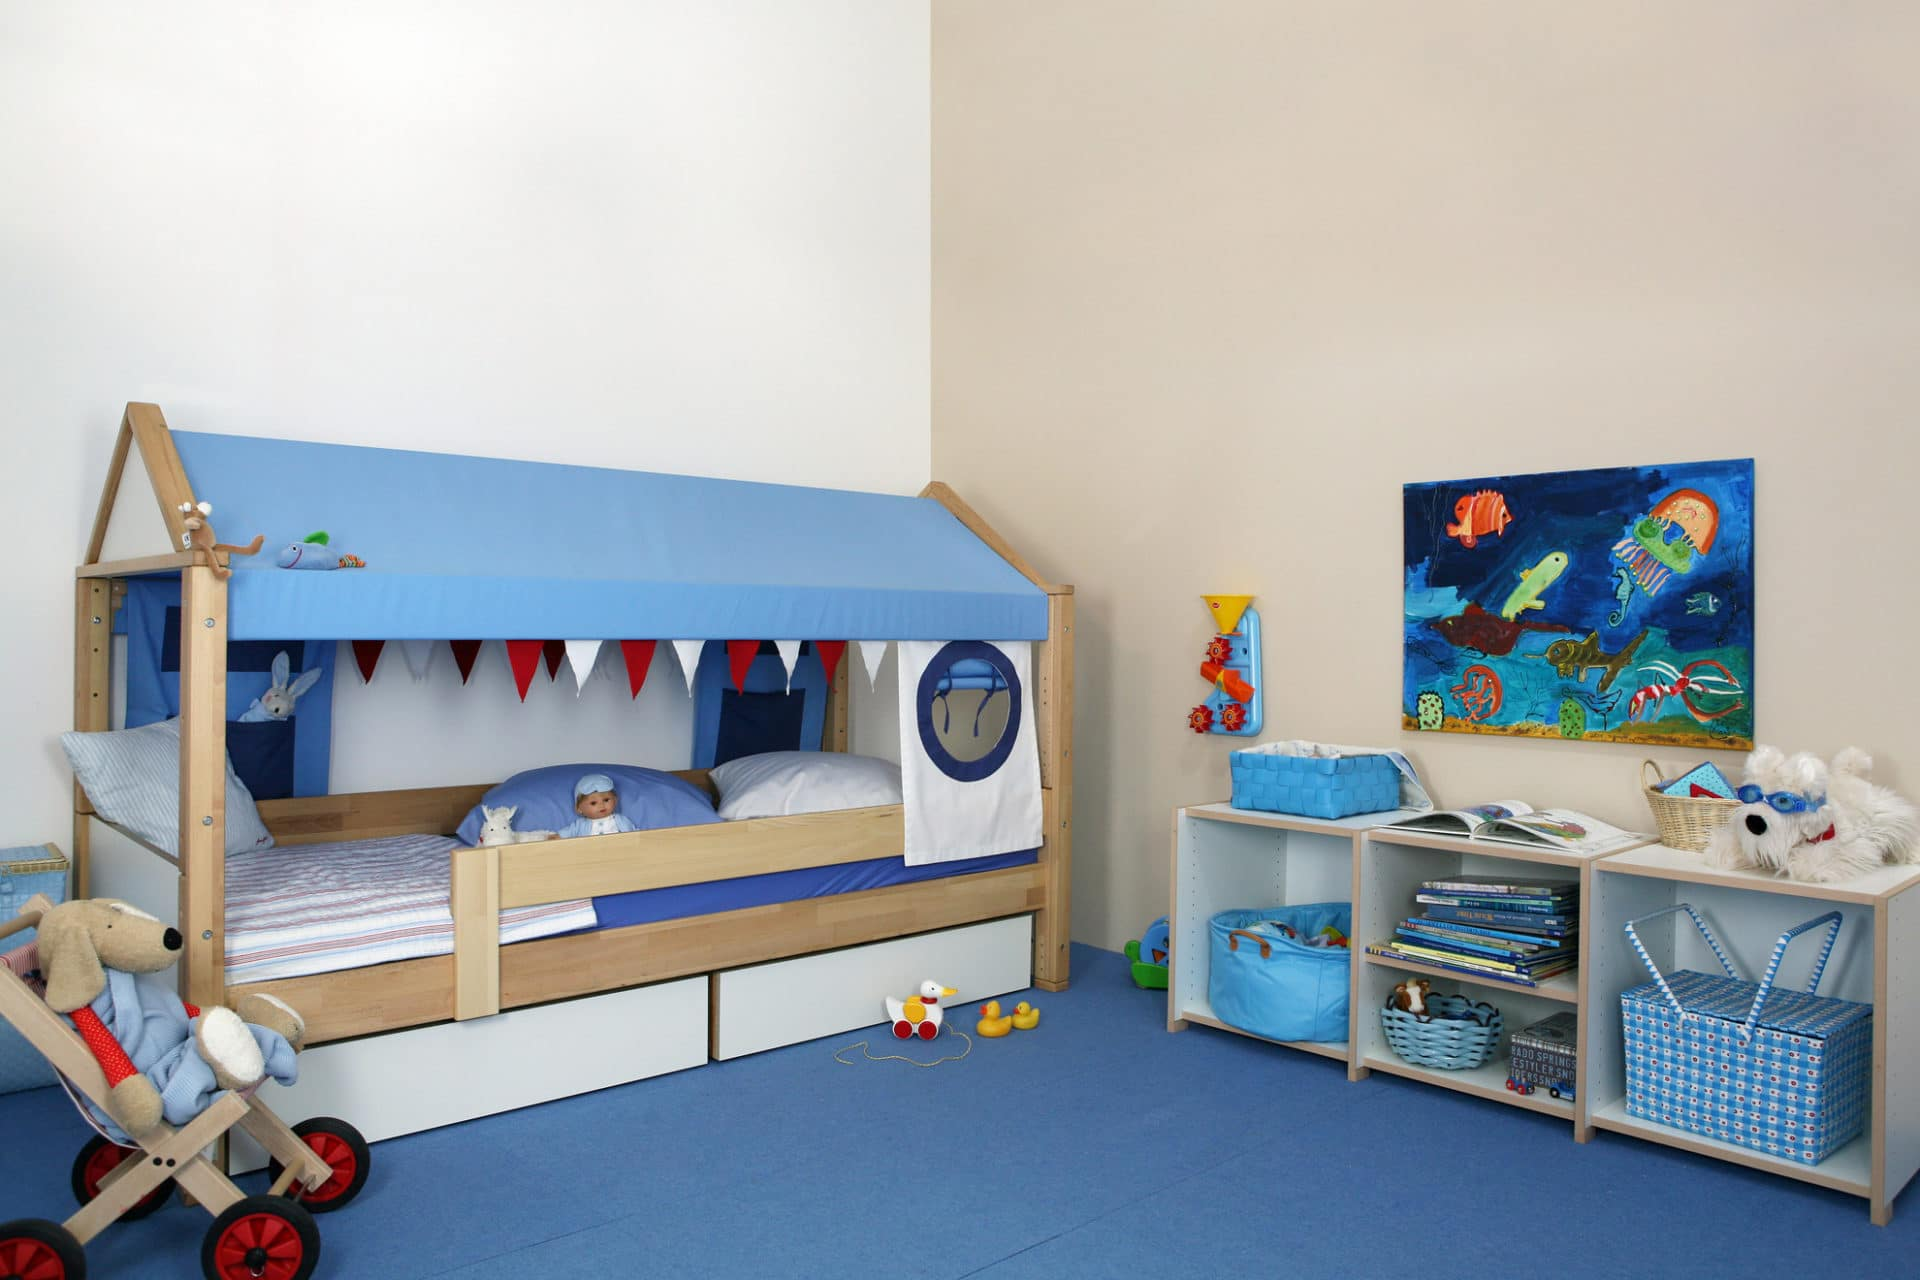 kinderbett wohnopposition berlin. Black Bedroom Furniture Sets. Home Design Ideas